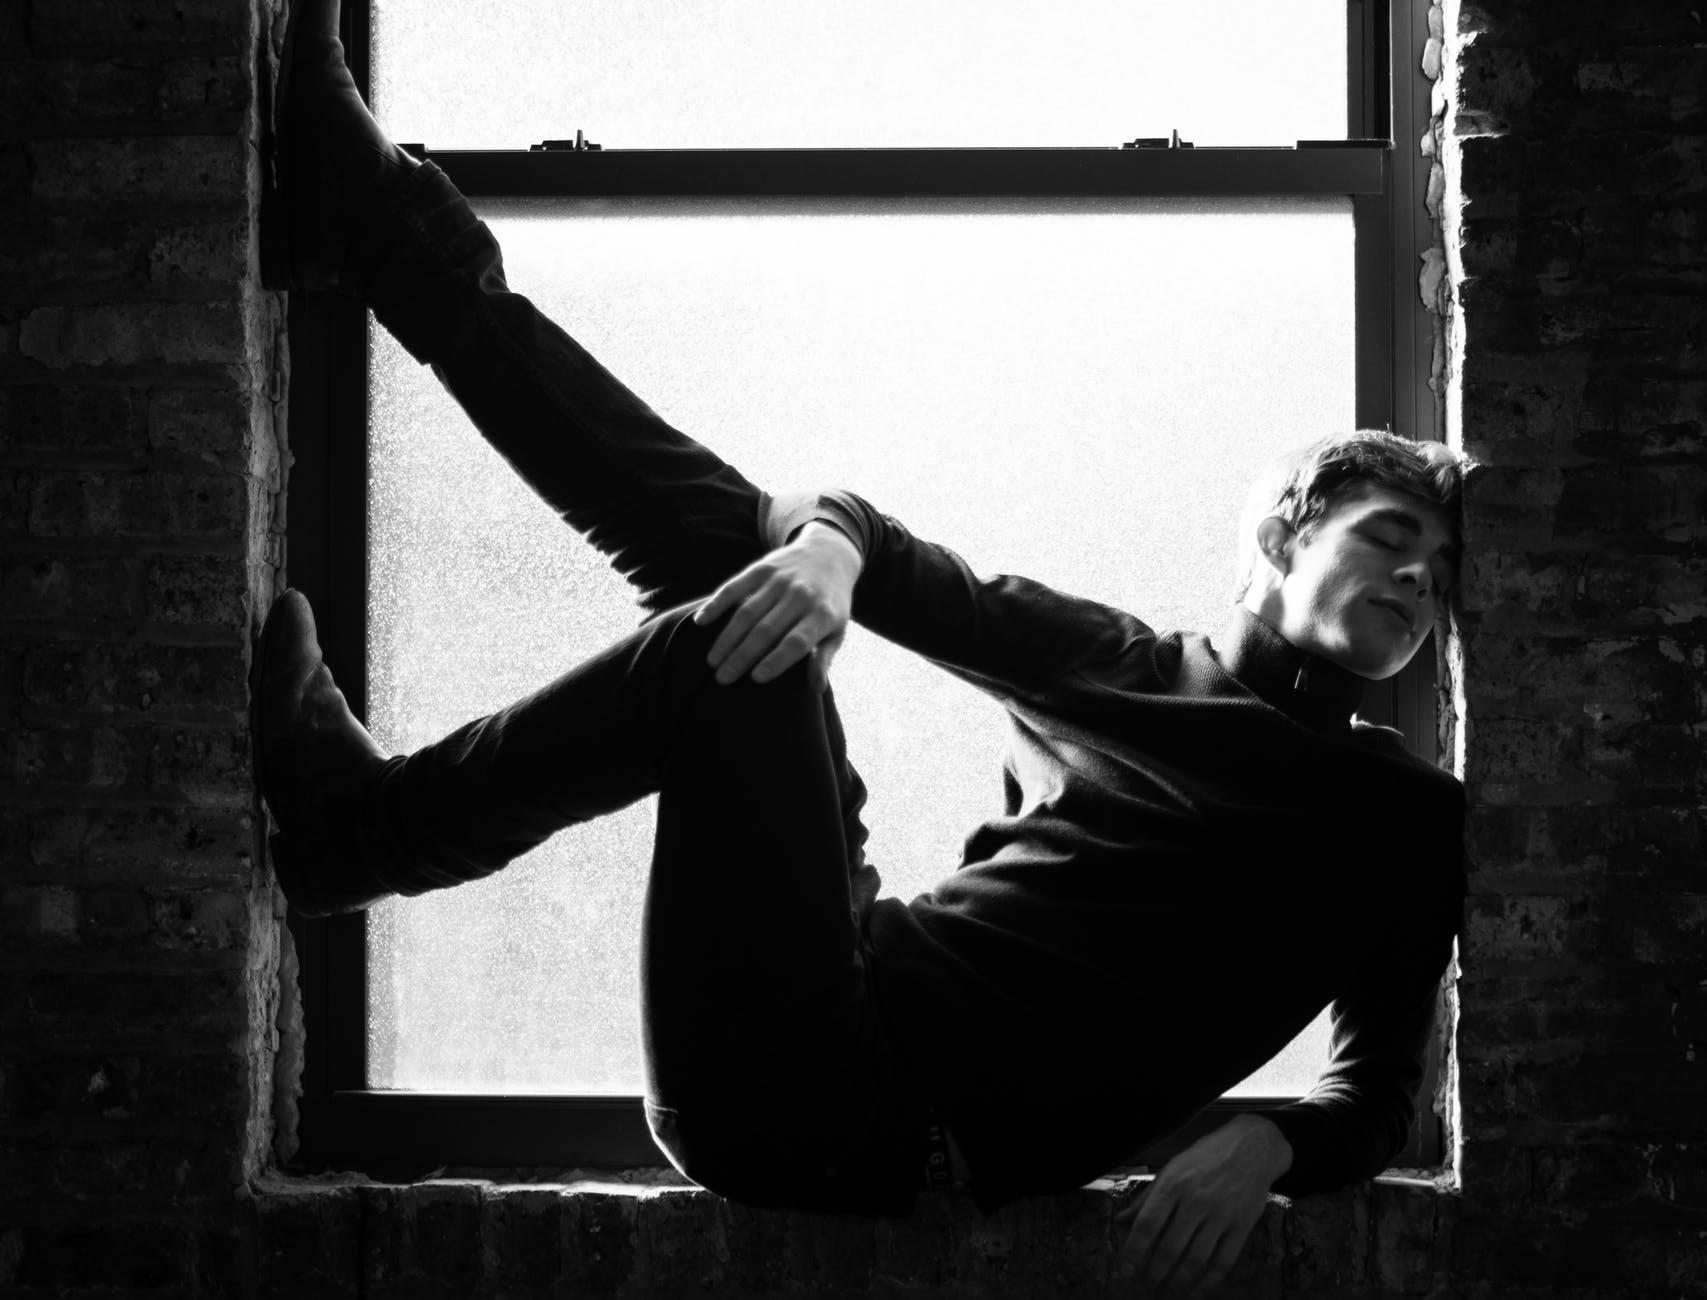 grayscale photography of man sitting near window